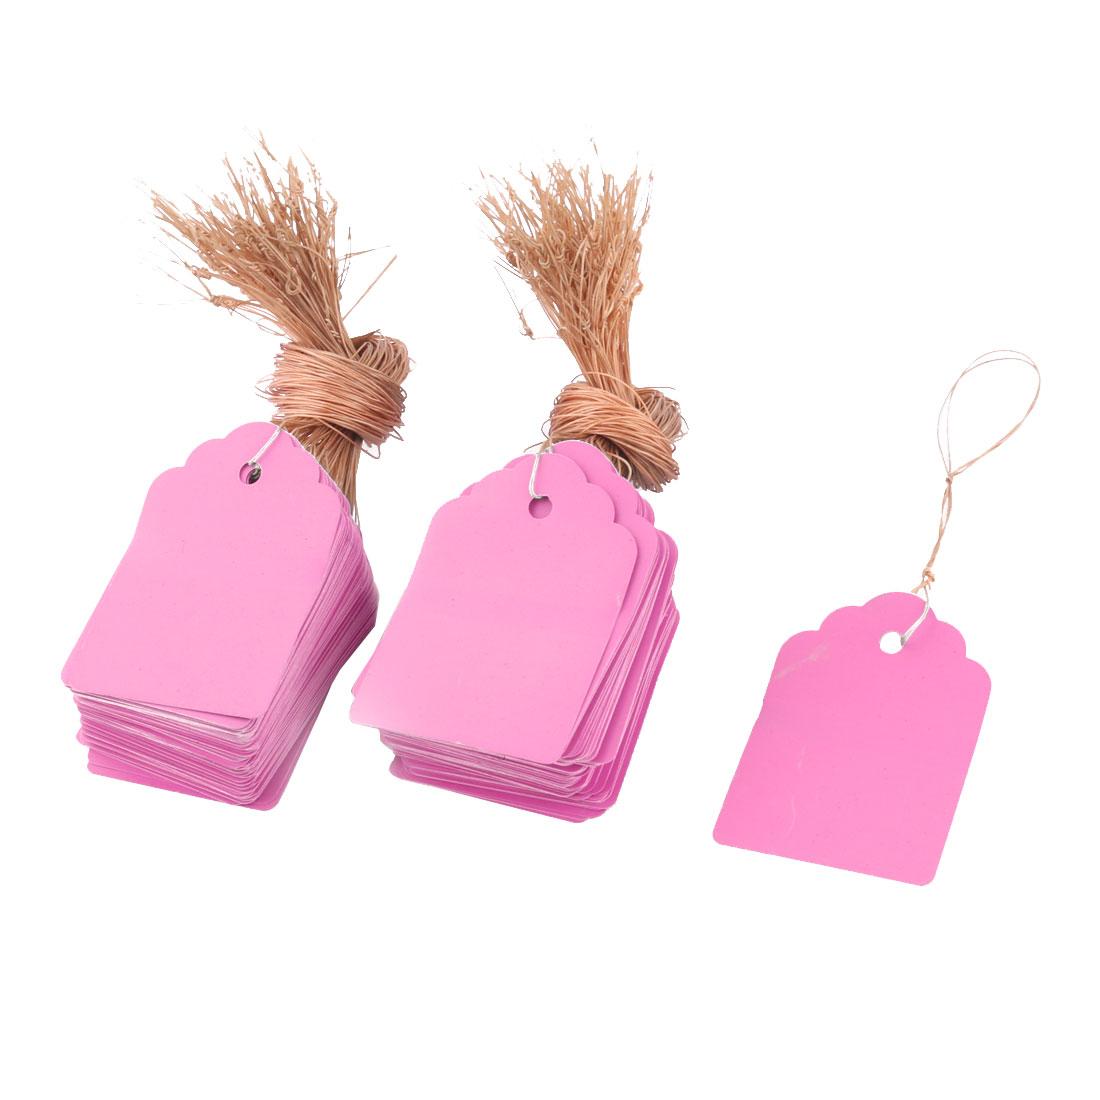 Yard Plastic Plant Flower Seed Hanging Name Tag Label Marker Pink 6 x 4cm 200pcs